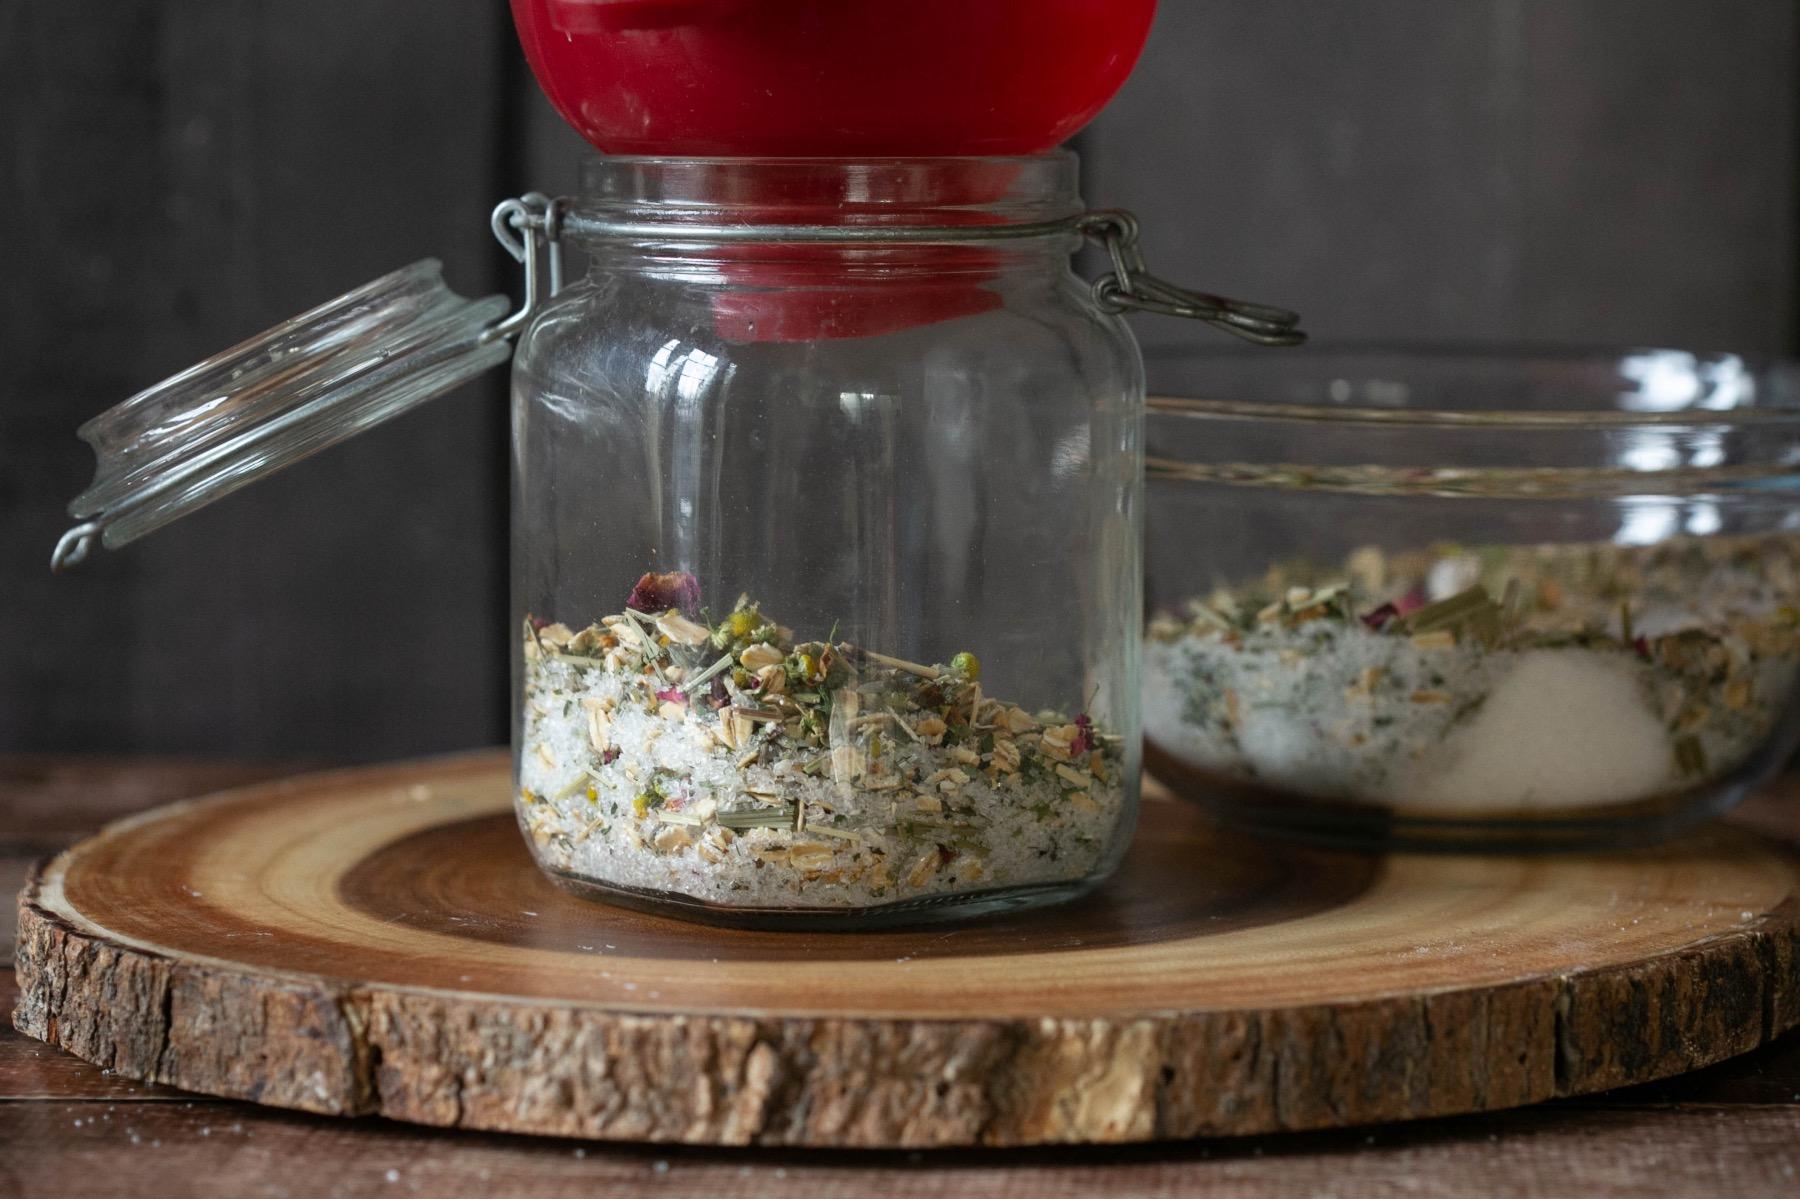 pour forest bath soaks ingredients into a glass jar